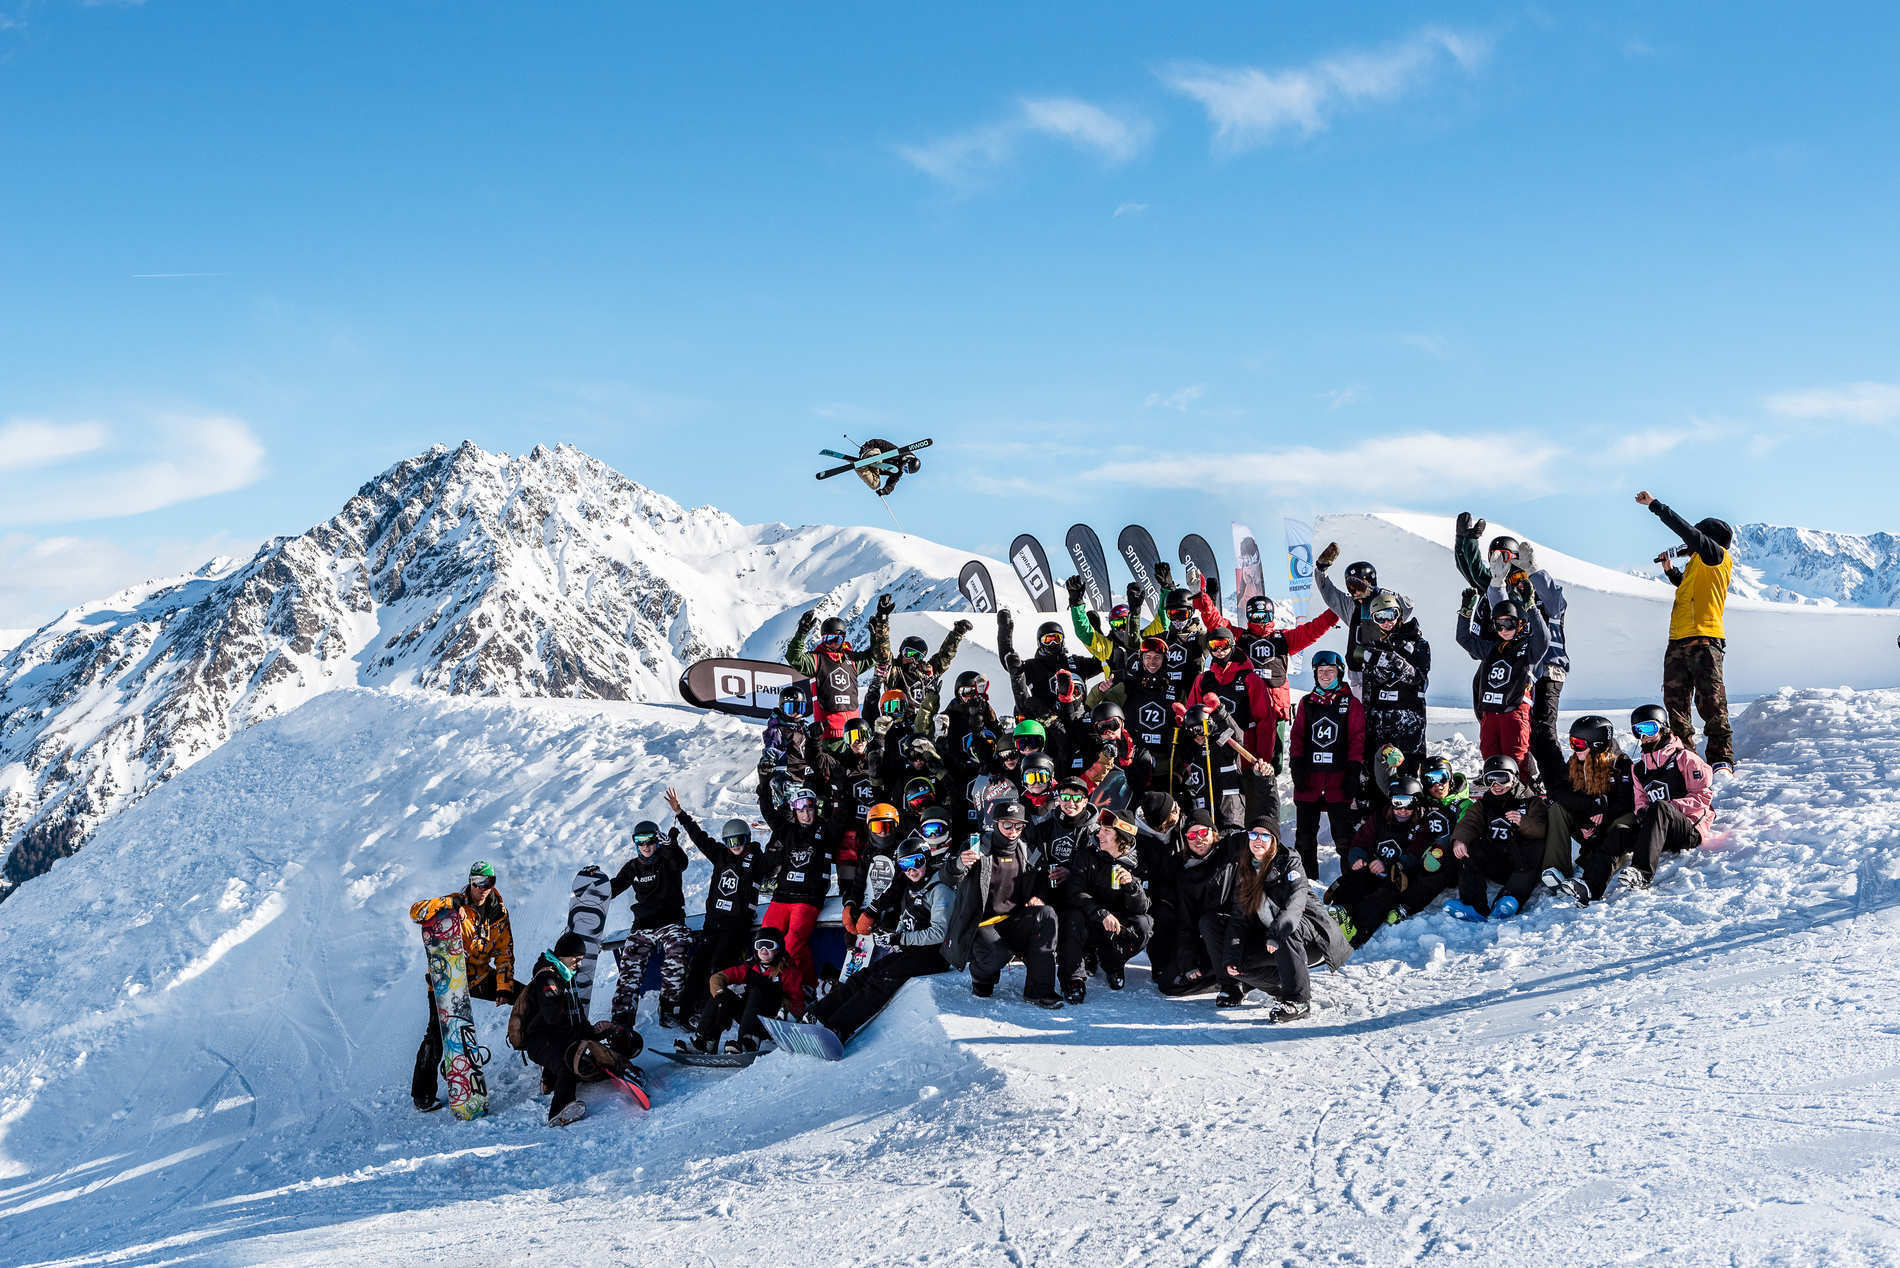 web schoeneben 09 02 2019 lifestyle fs sb unknown rider christian riefenberg qparks 9